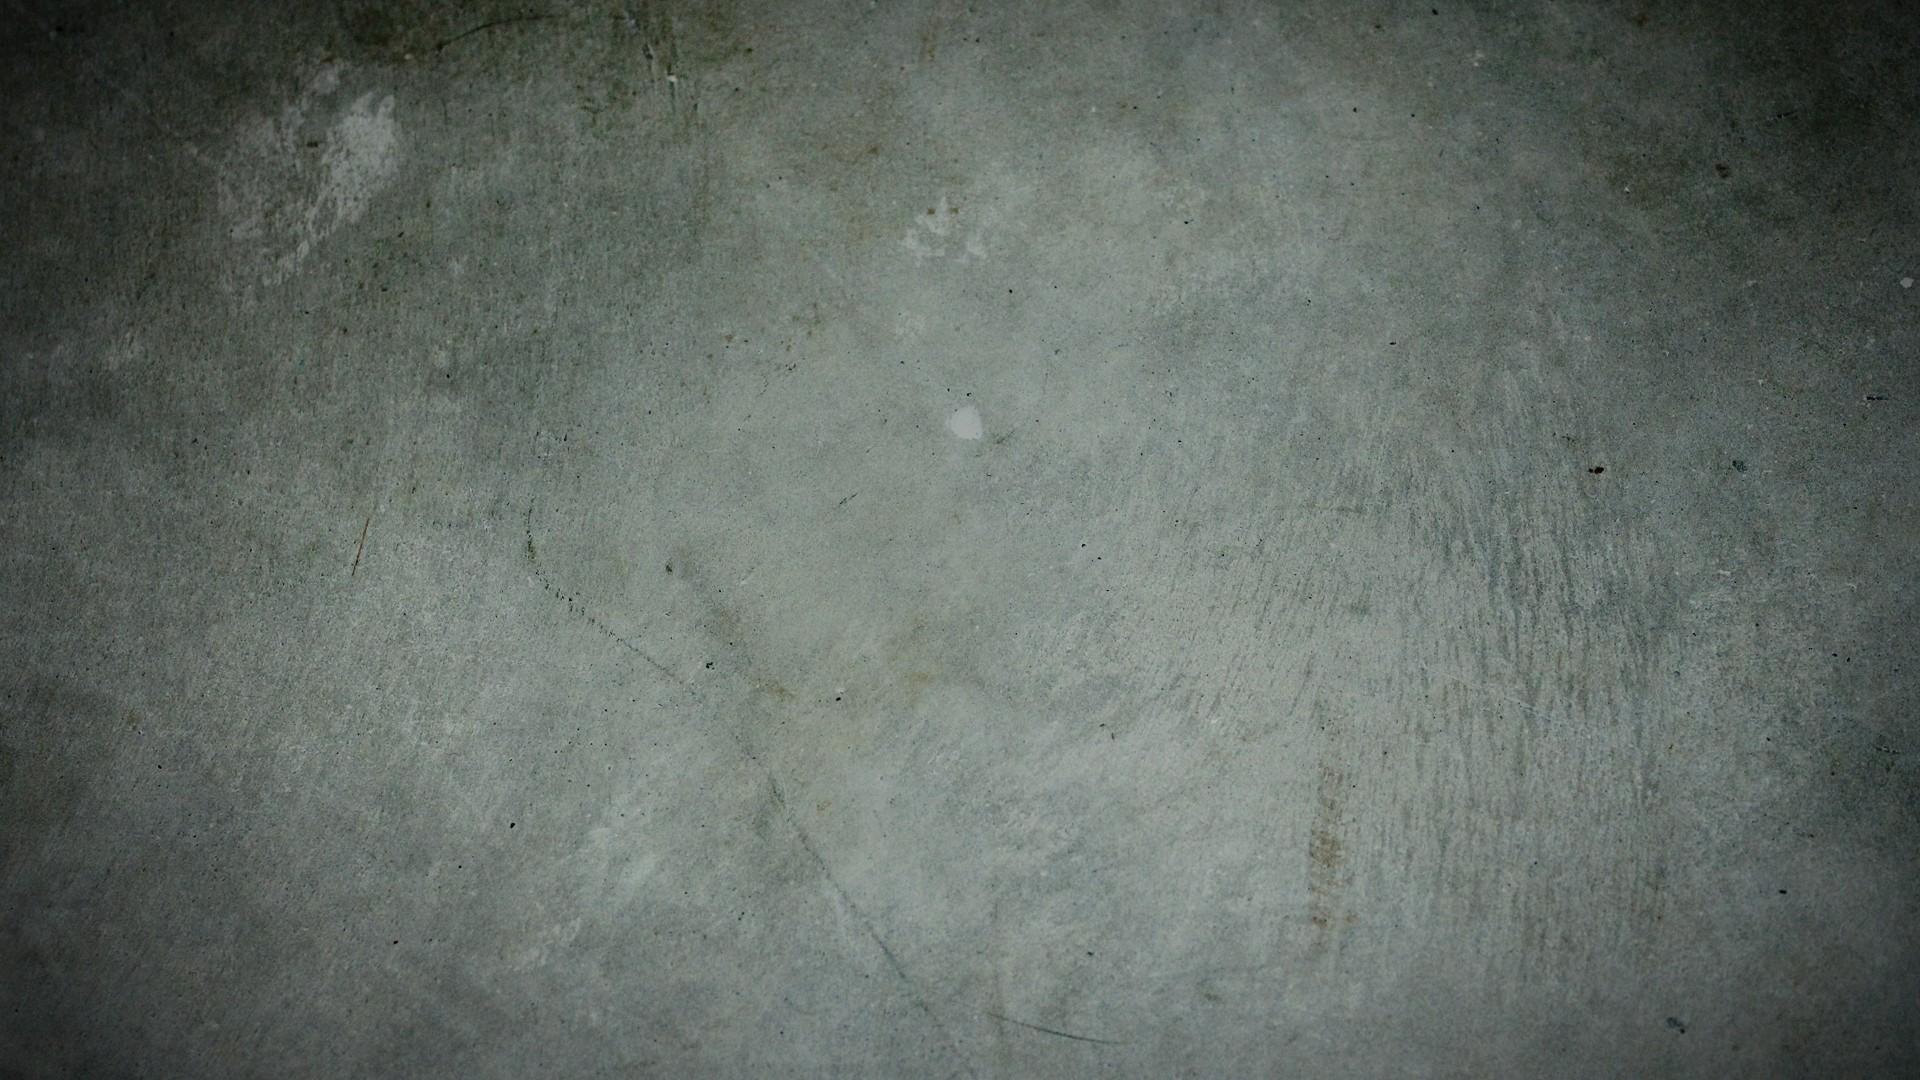 Black grunge background download free awesome hd - White grunge background 1920x1080 ...